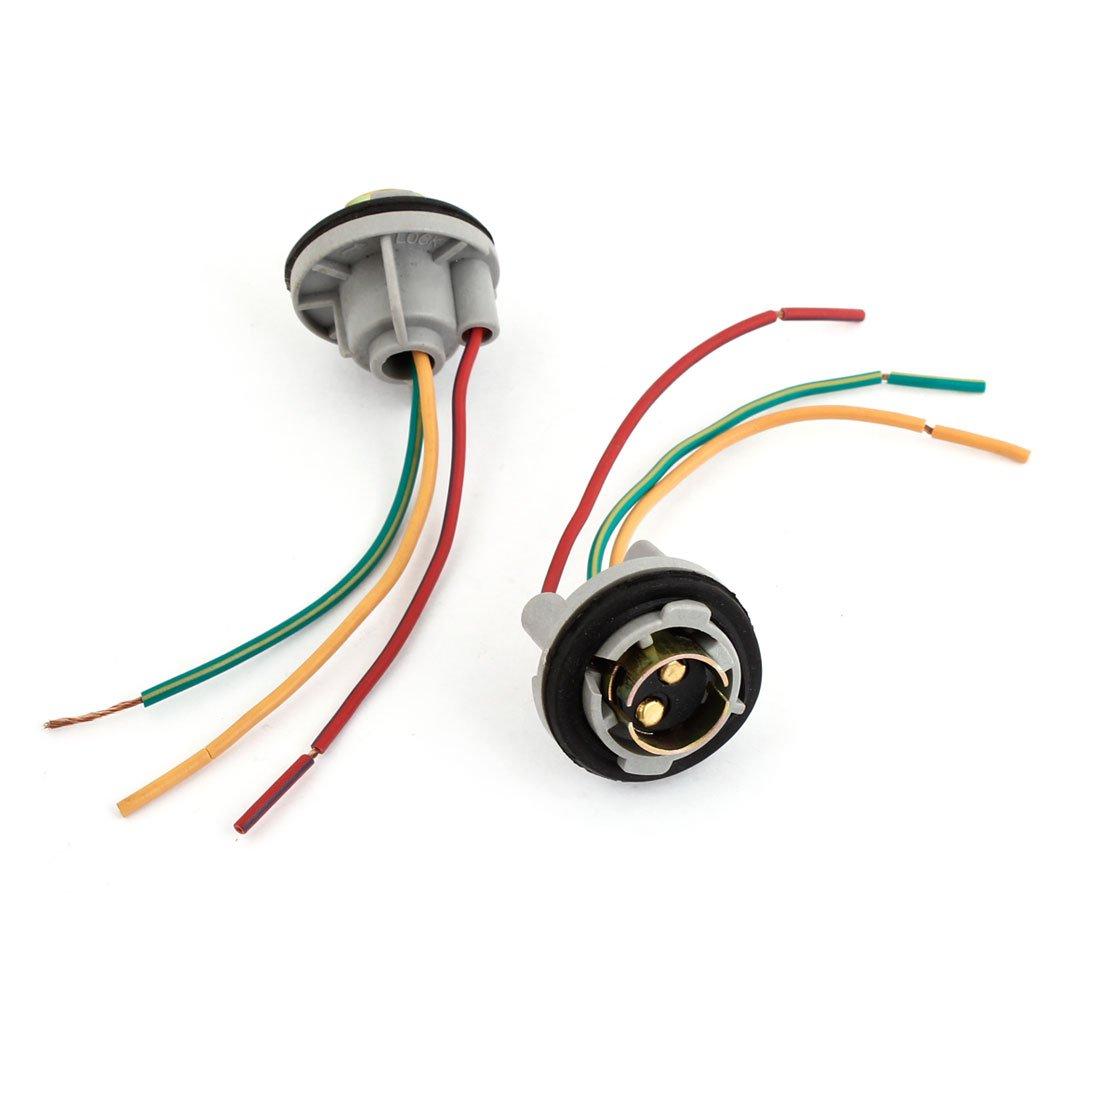 uxcell 1157 Signal Brake Light Bulb Socket Connector Wire Harness Plug 2 Pcs a14022000ux0115